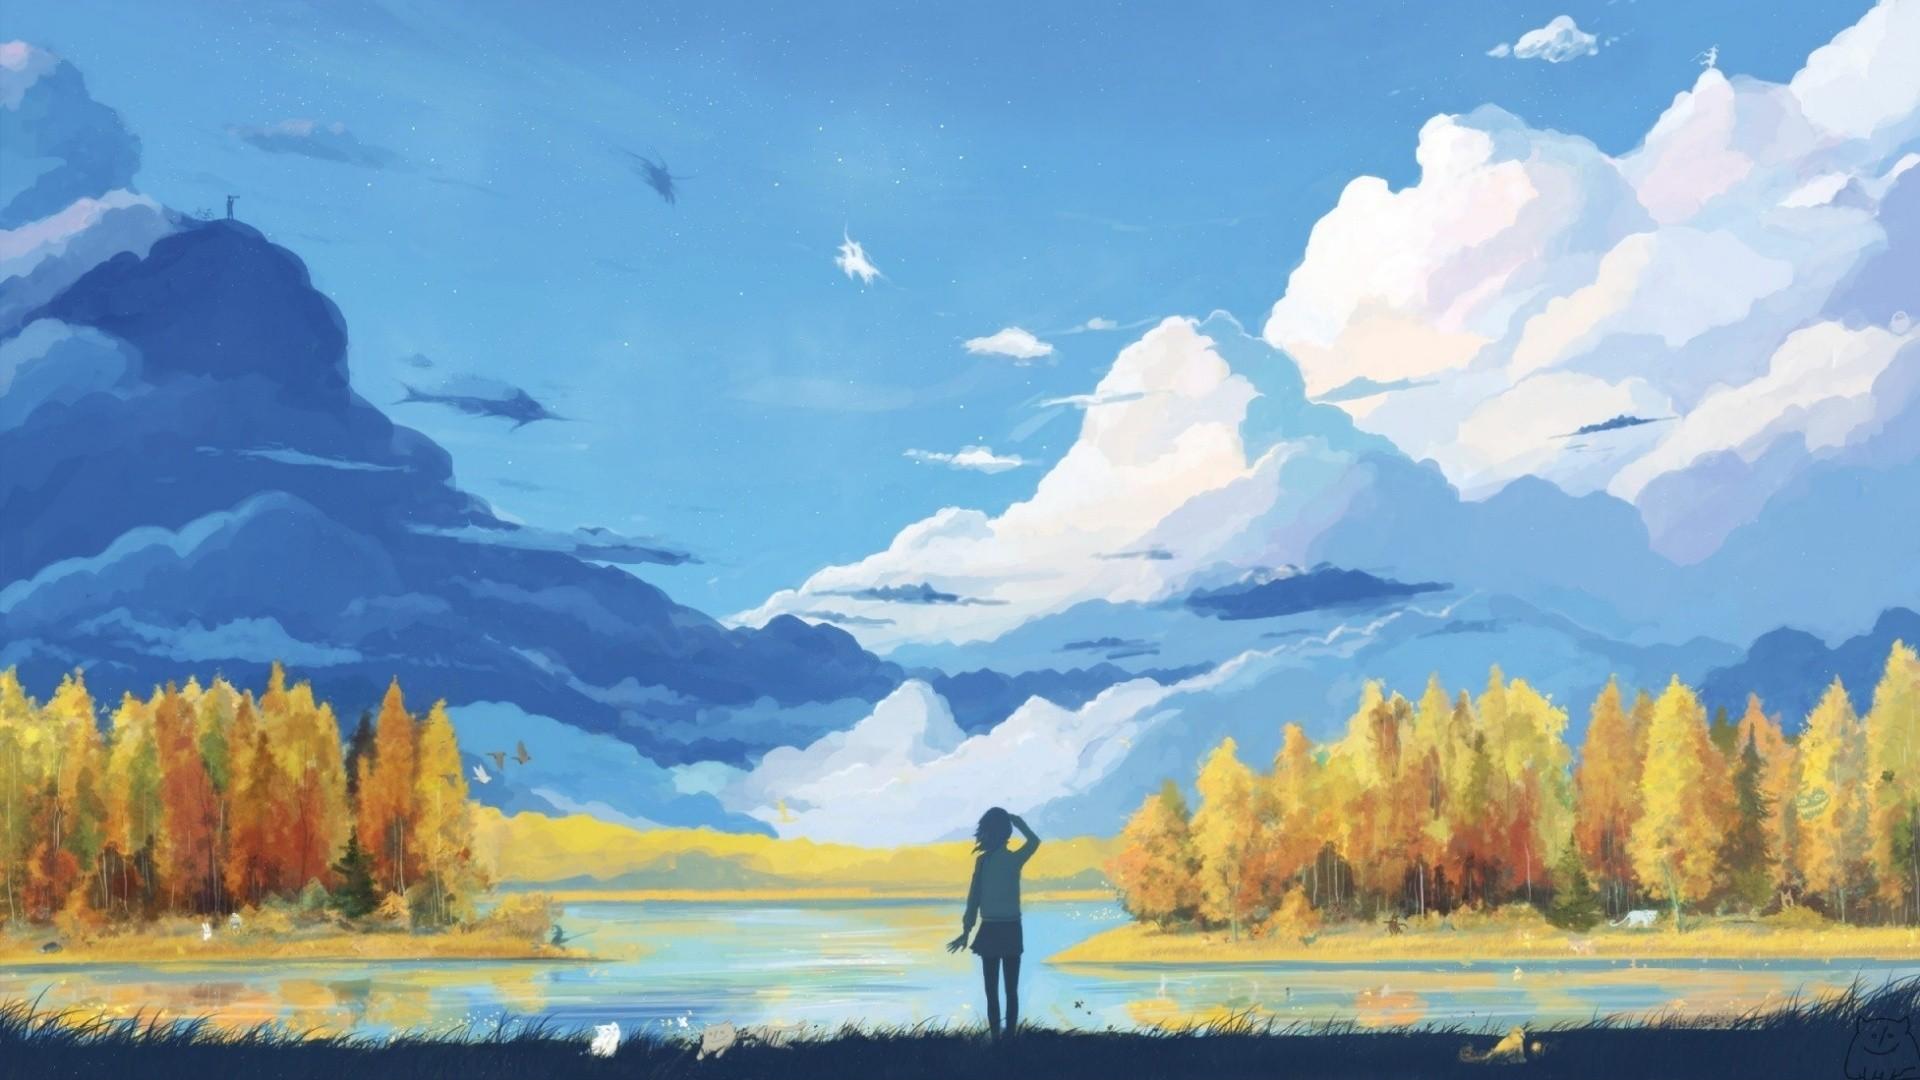 Anime Landscape Wallpaper HD Download Download Desktop 1920x1080